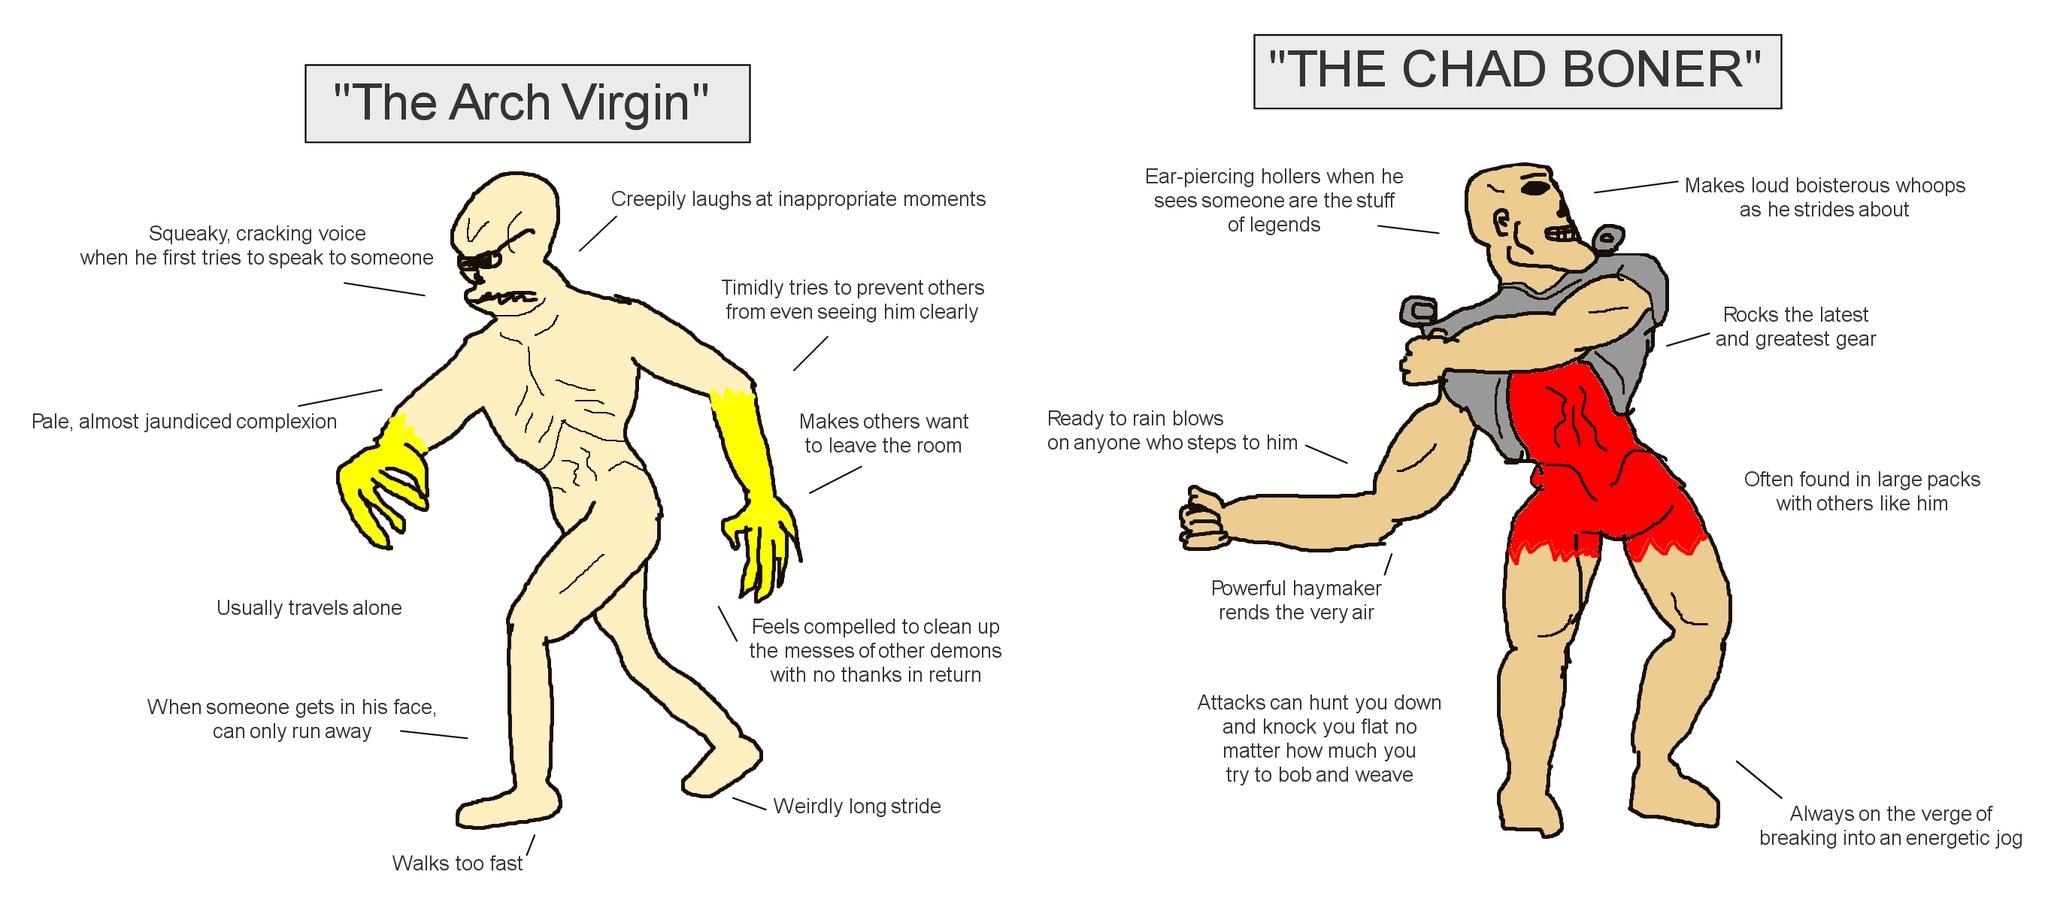 The Arch Virgin vs. The Chad Boner